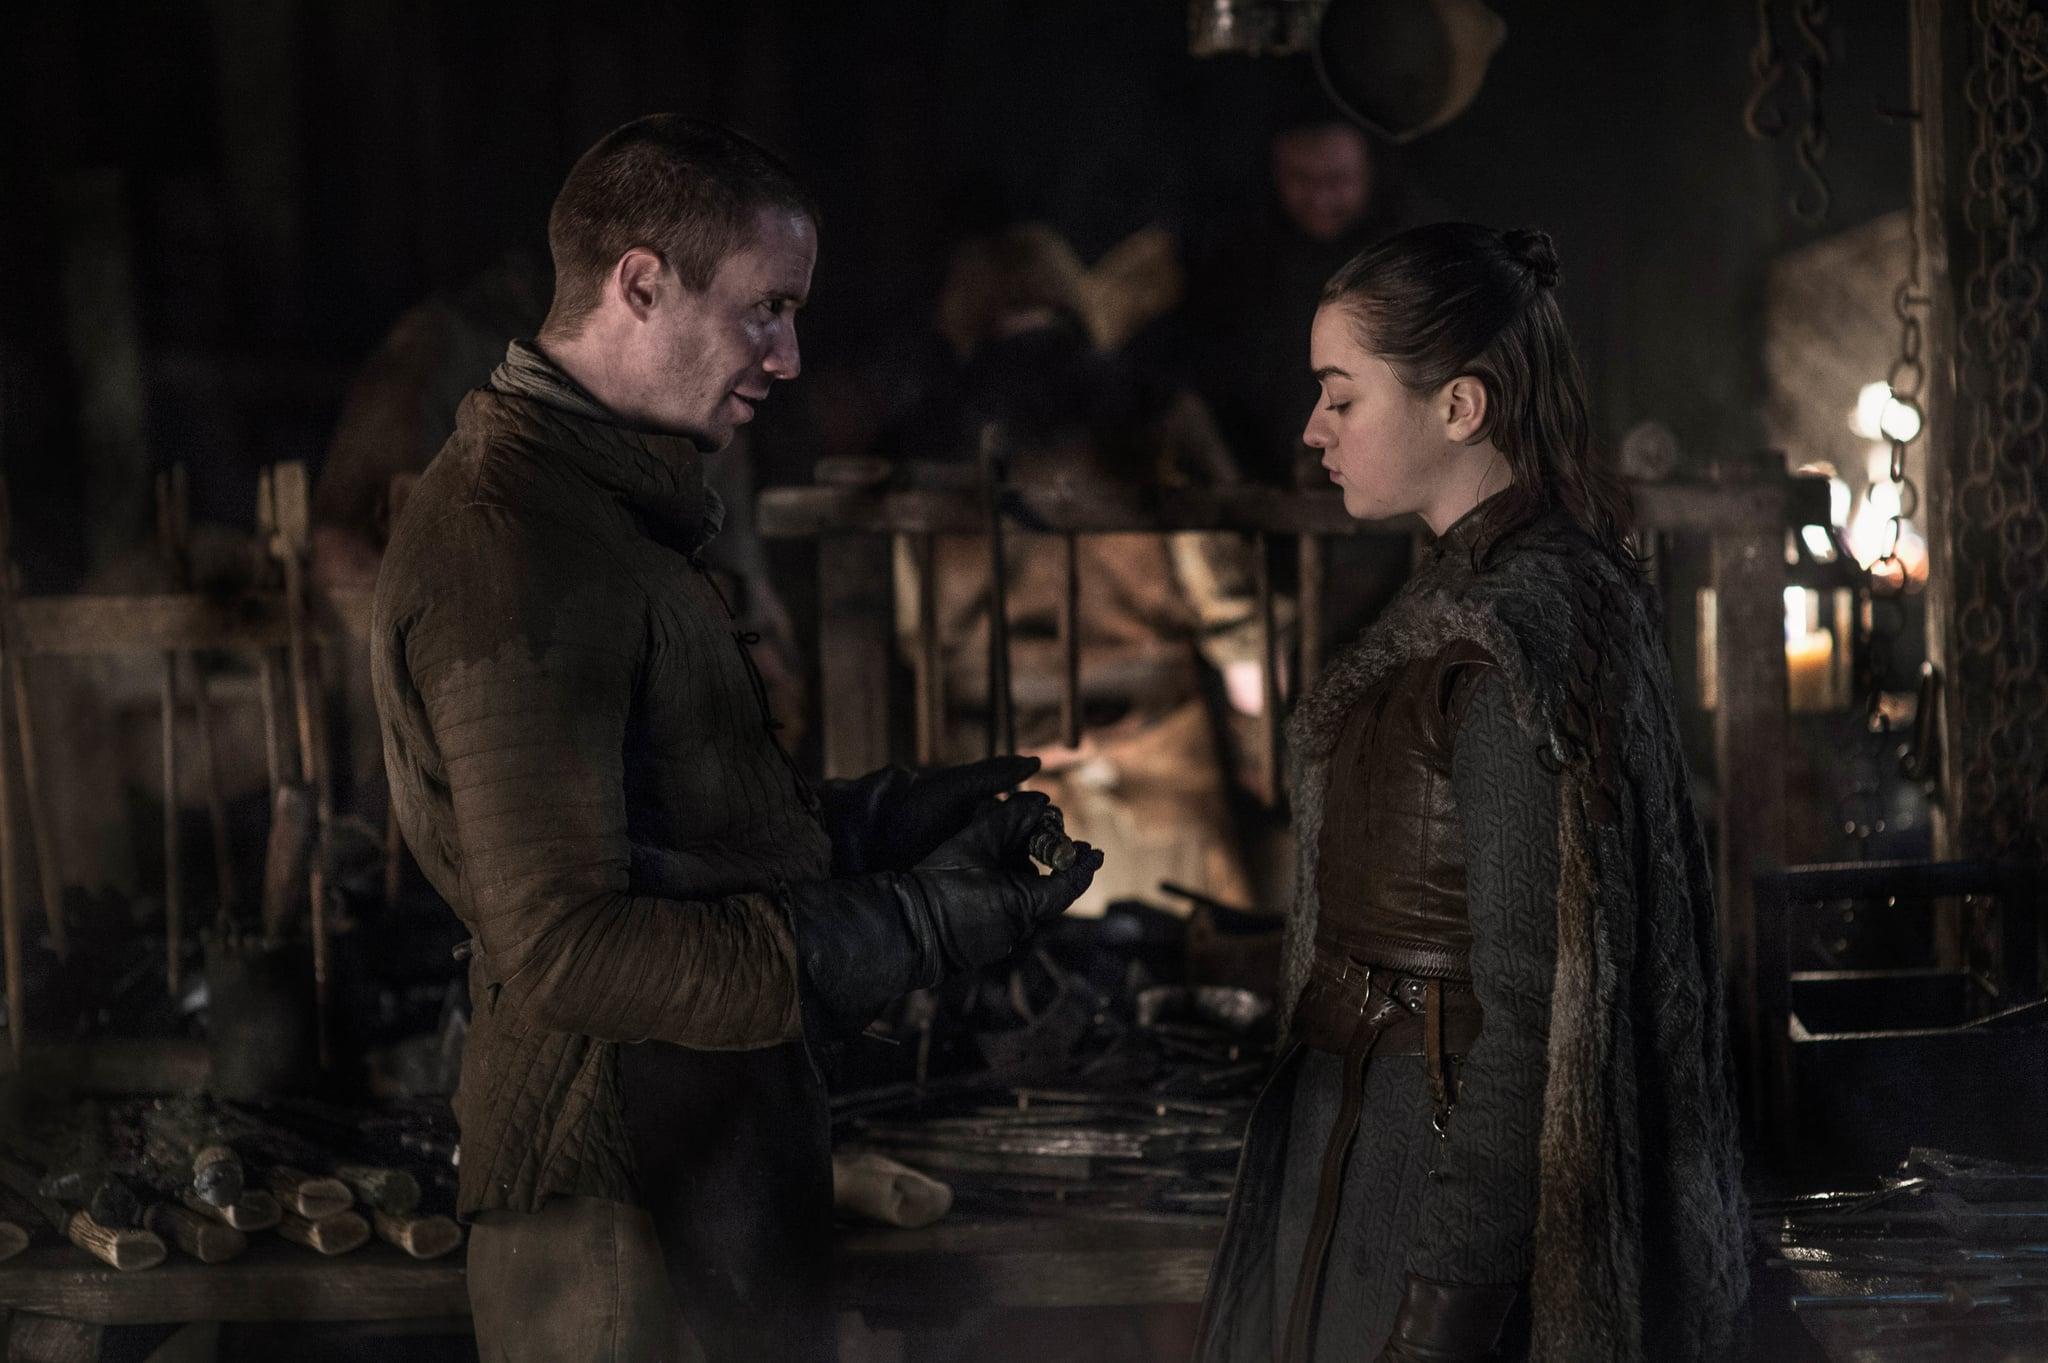 Arya Stark and Gendry Waters exchange pointers.